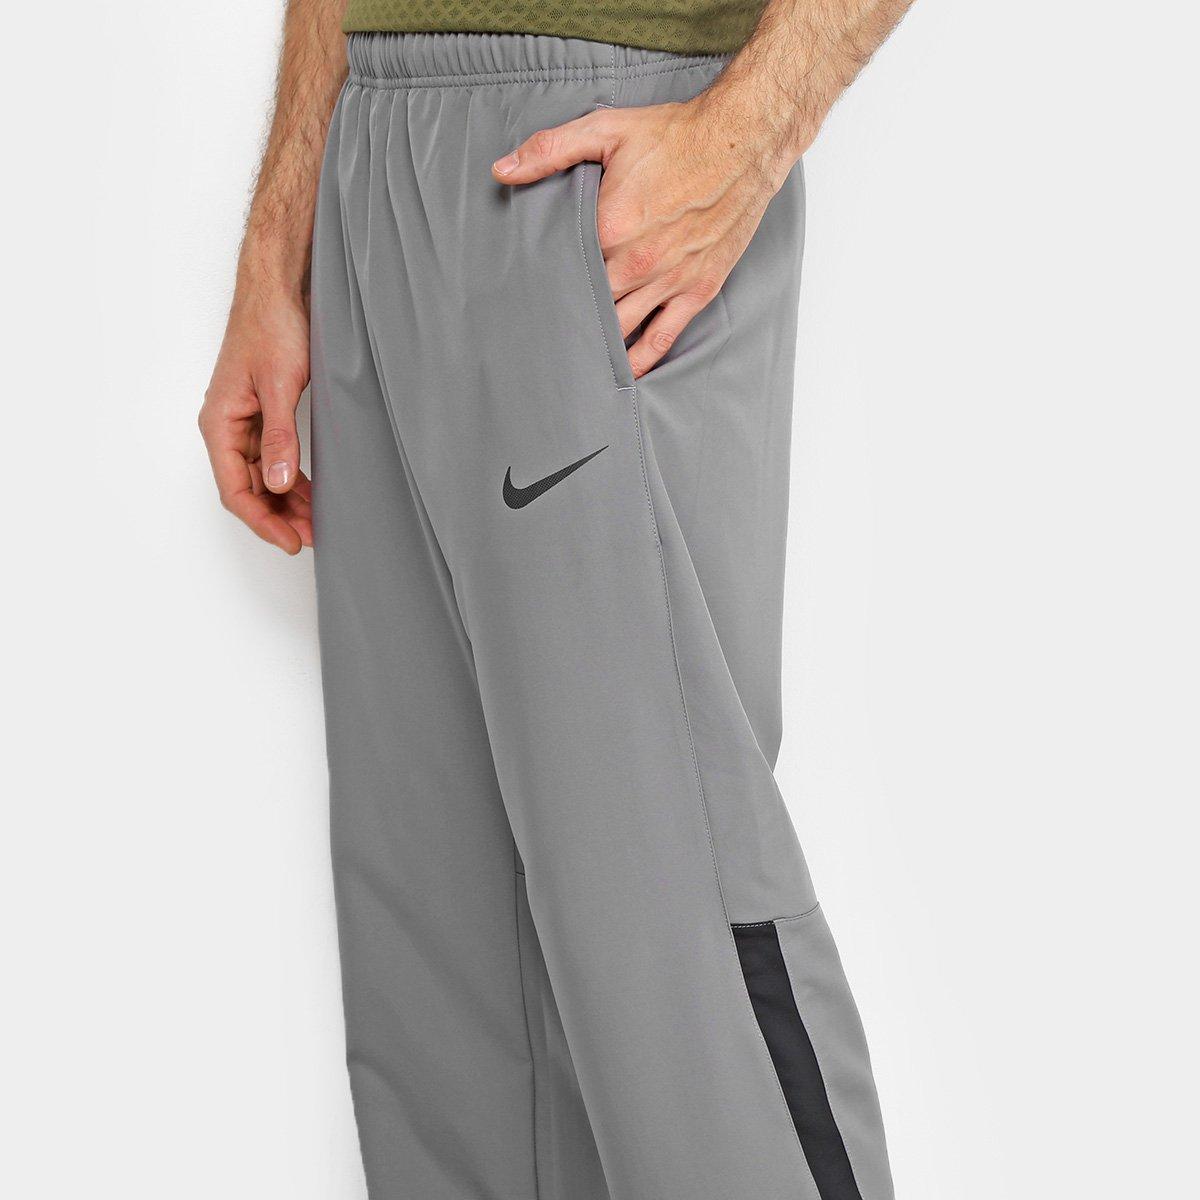 21b6096801bec Calça Nike Dry Team Woven Masculina - Tam: P - Shopping TudoAzul